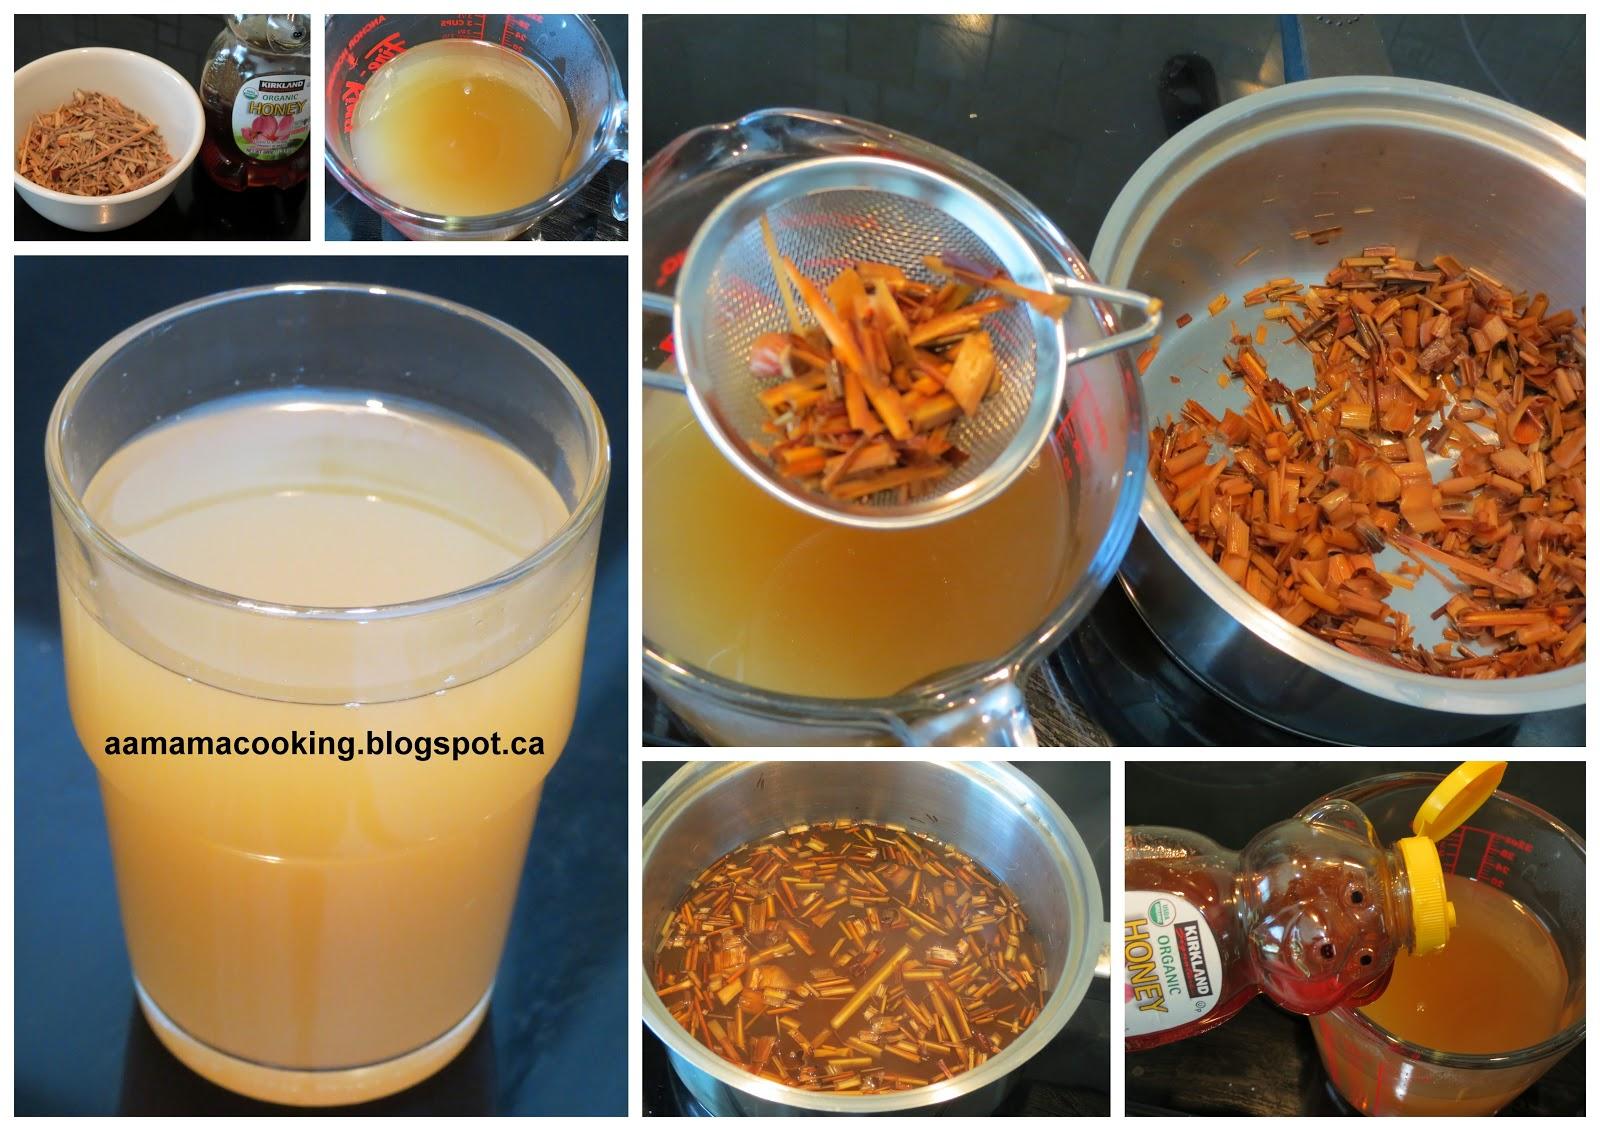 AA mama: 蜂蜜香茅茶 (乾香茅葉) Honey Lemongrass Tea